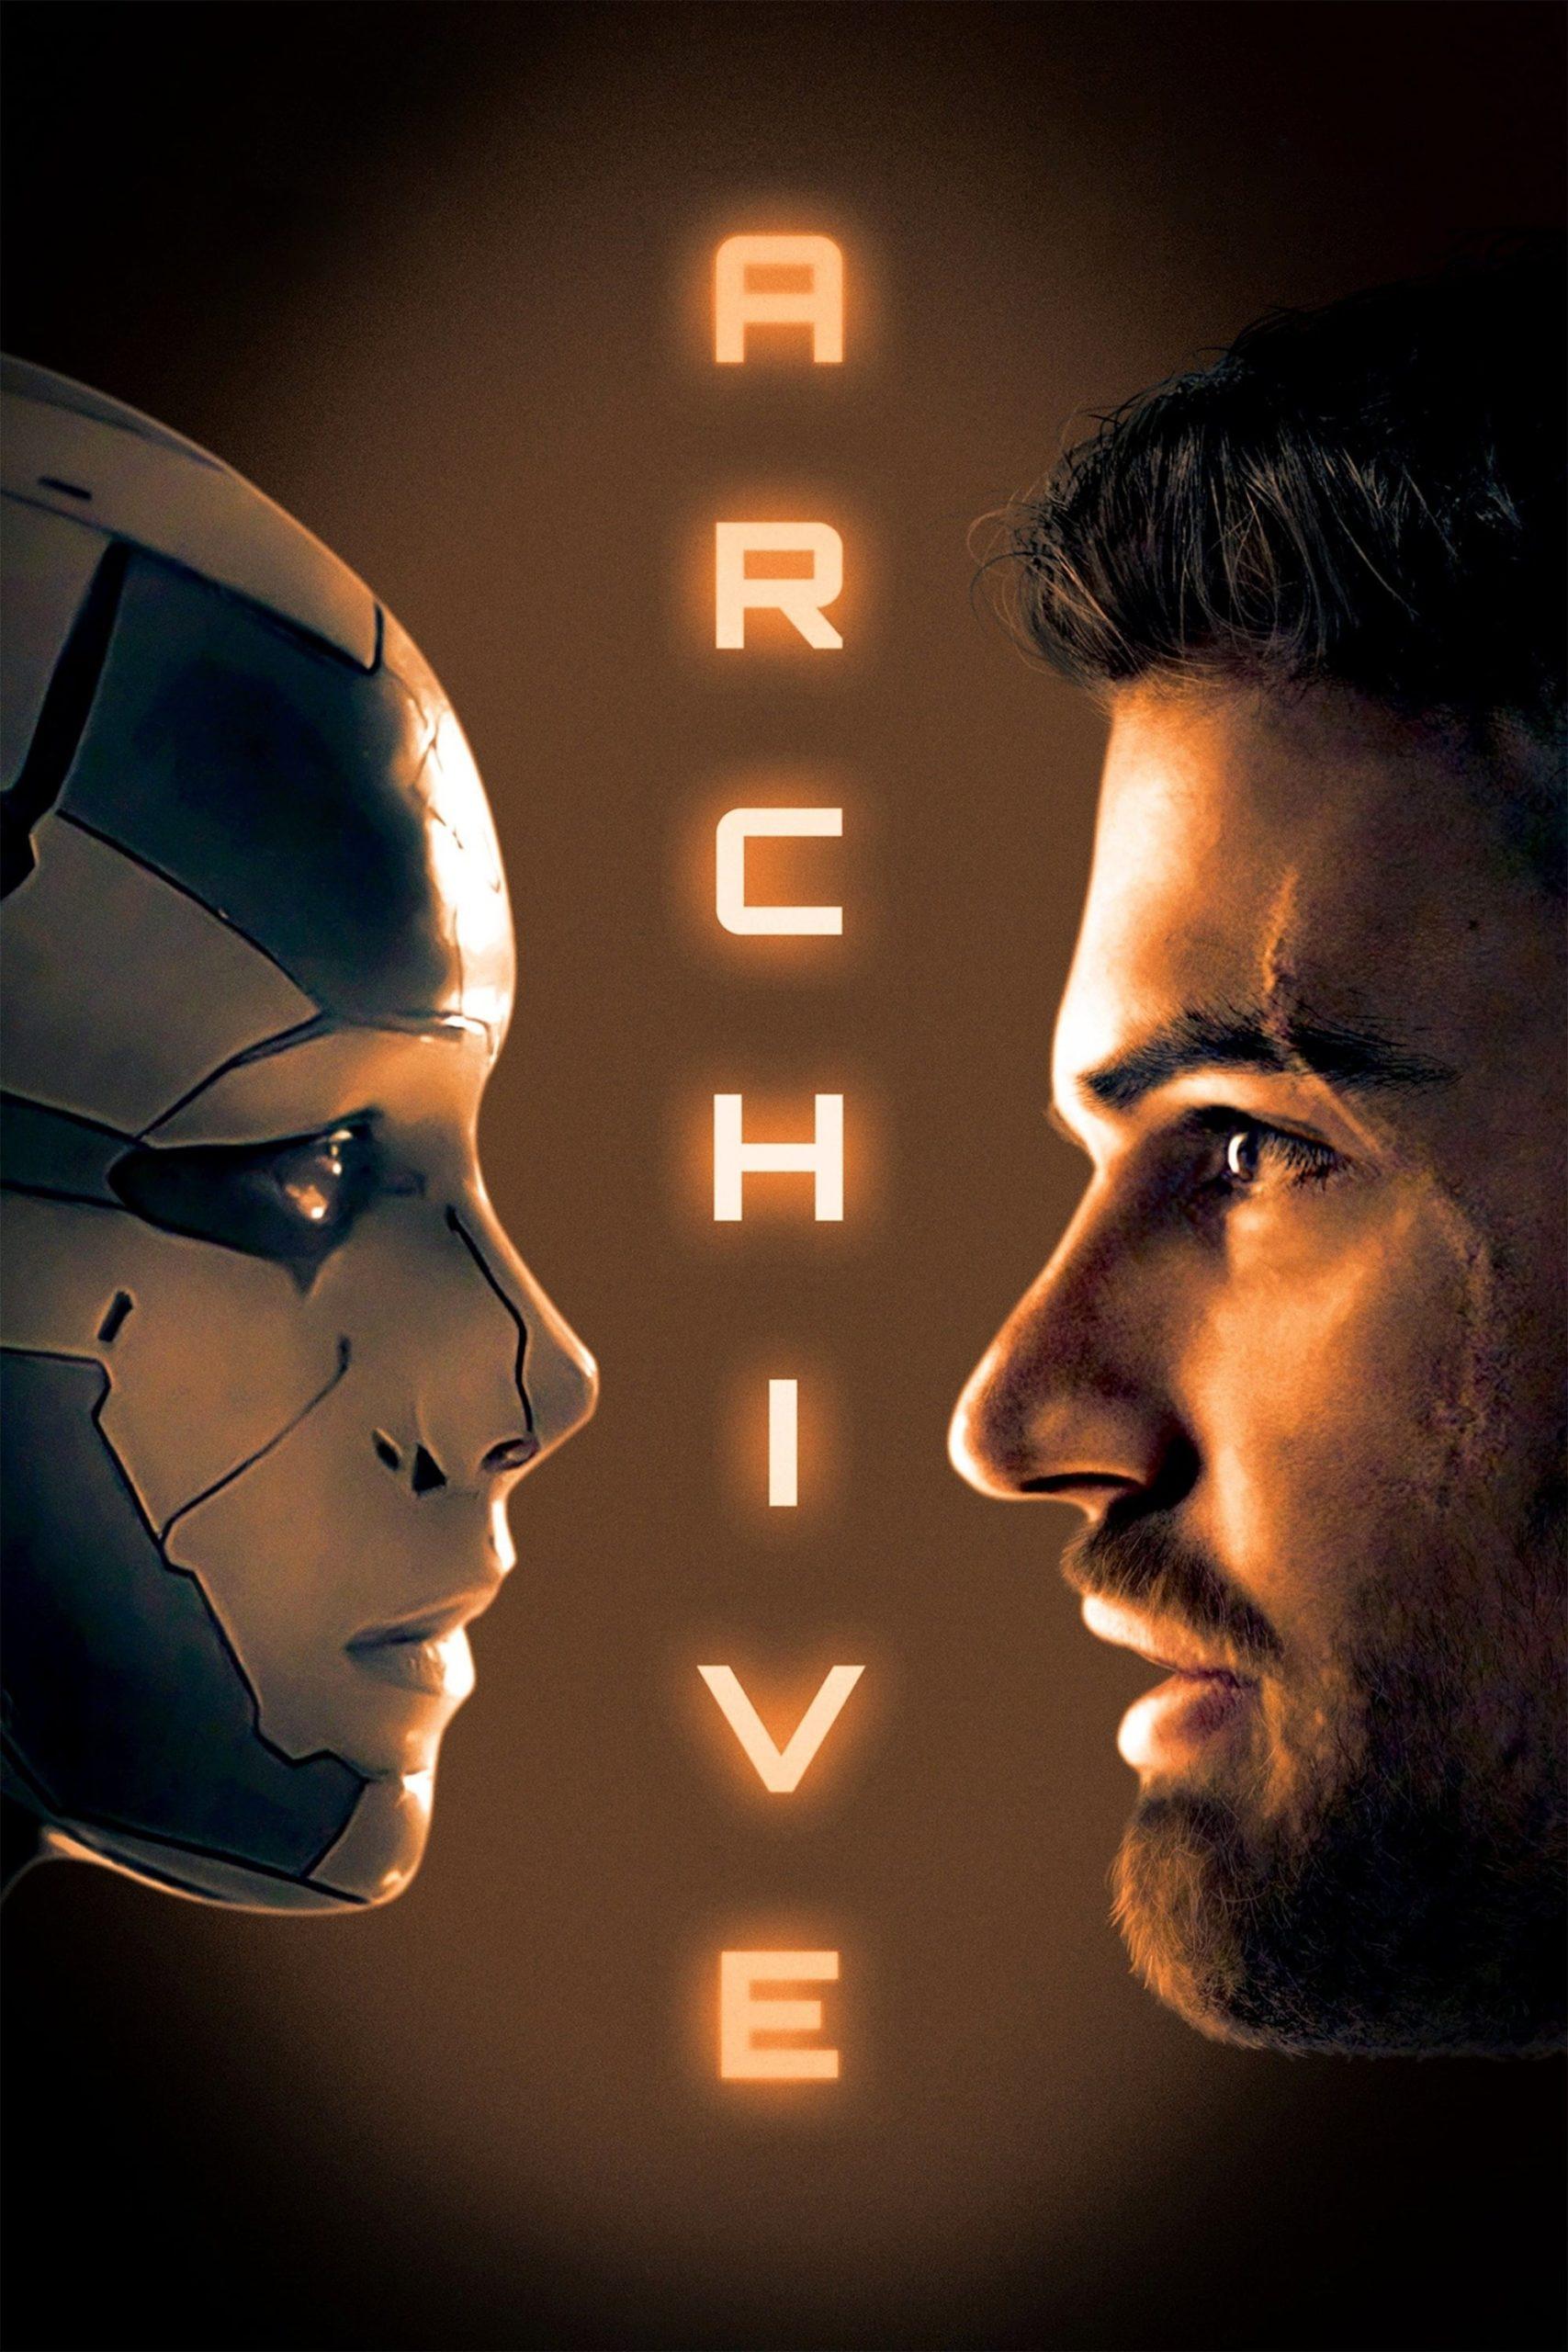 Regarder Archive en streaming gratuit